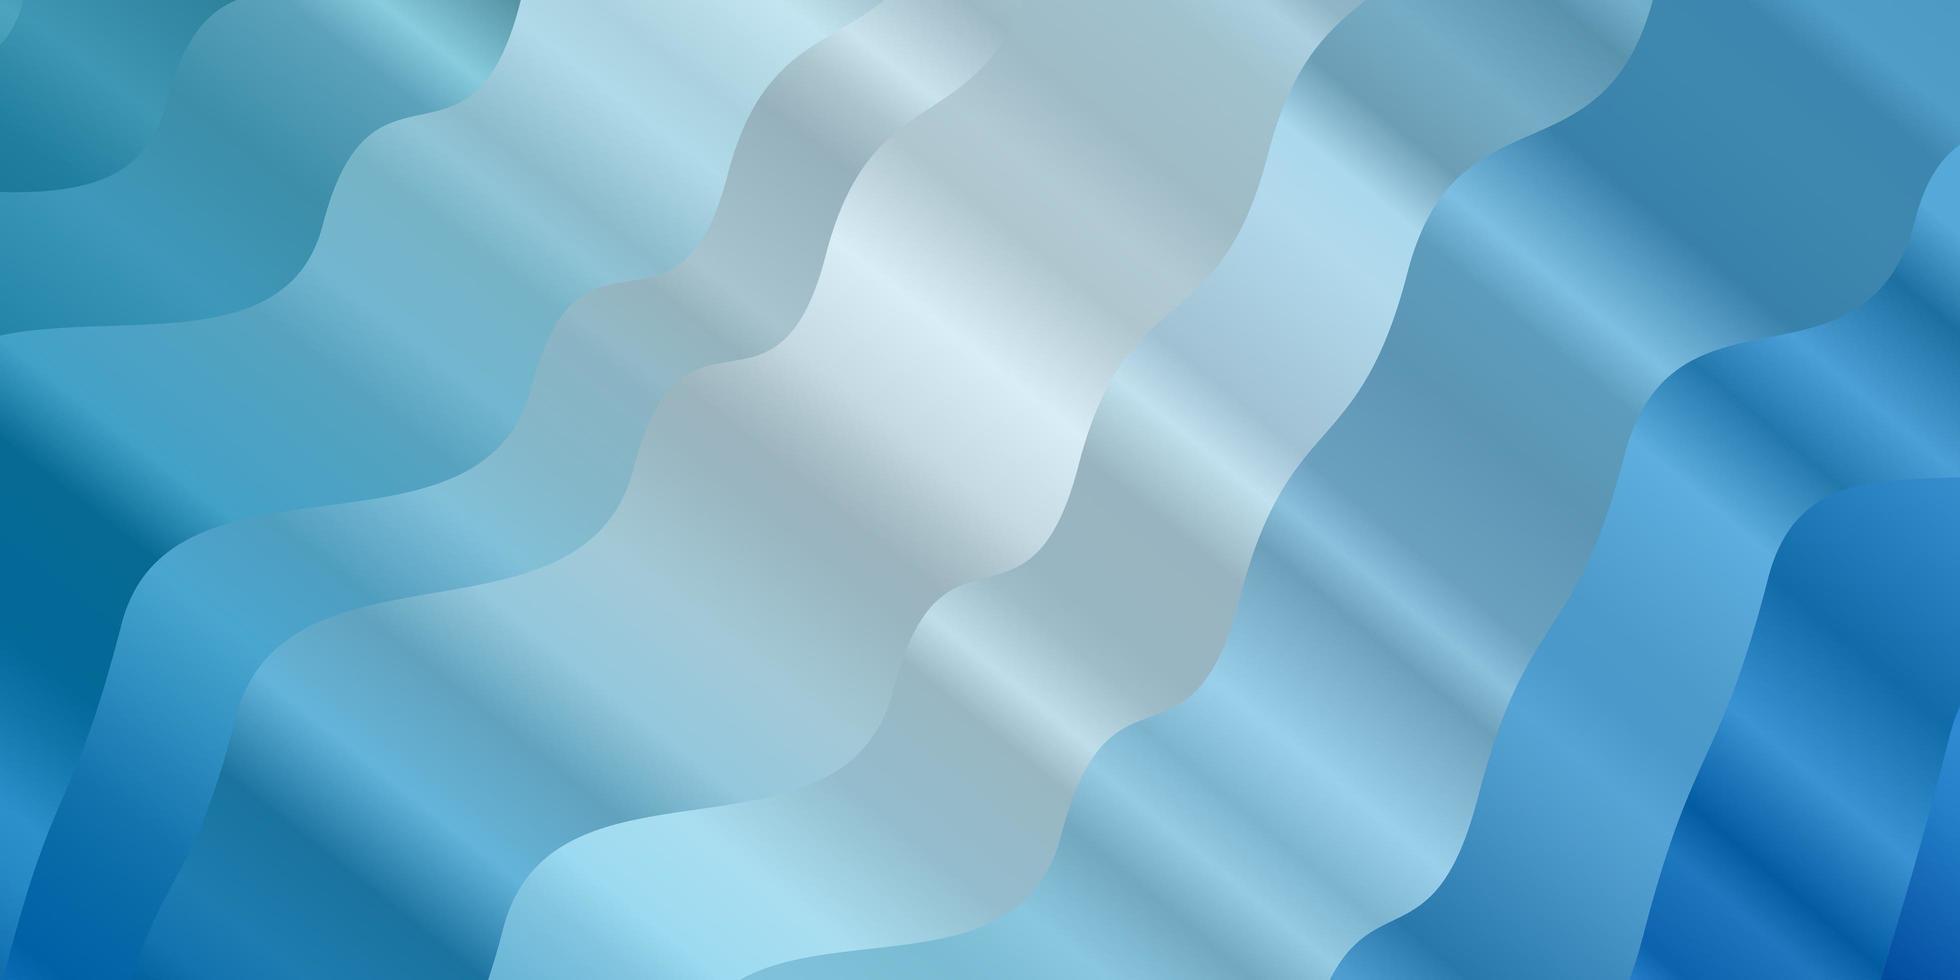 ljusblå vektorbakgrund med böjda linjer vektor